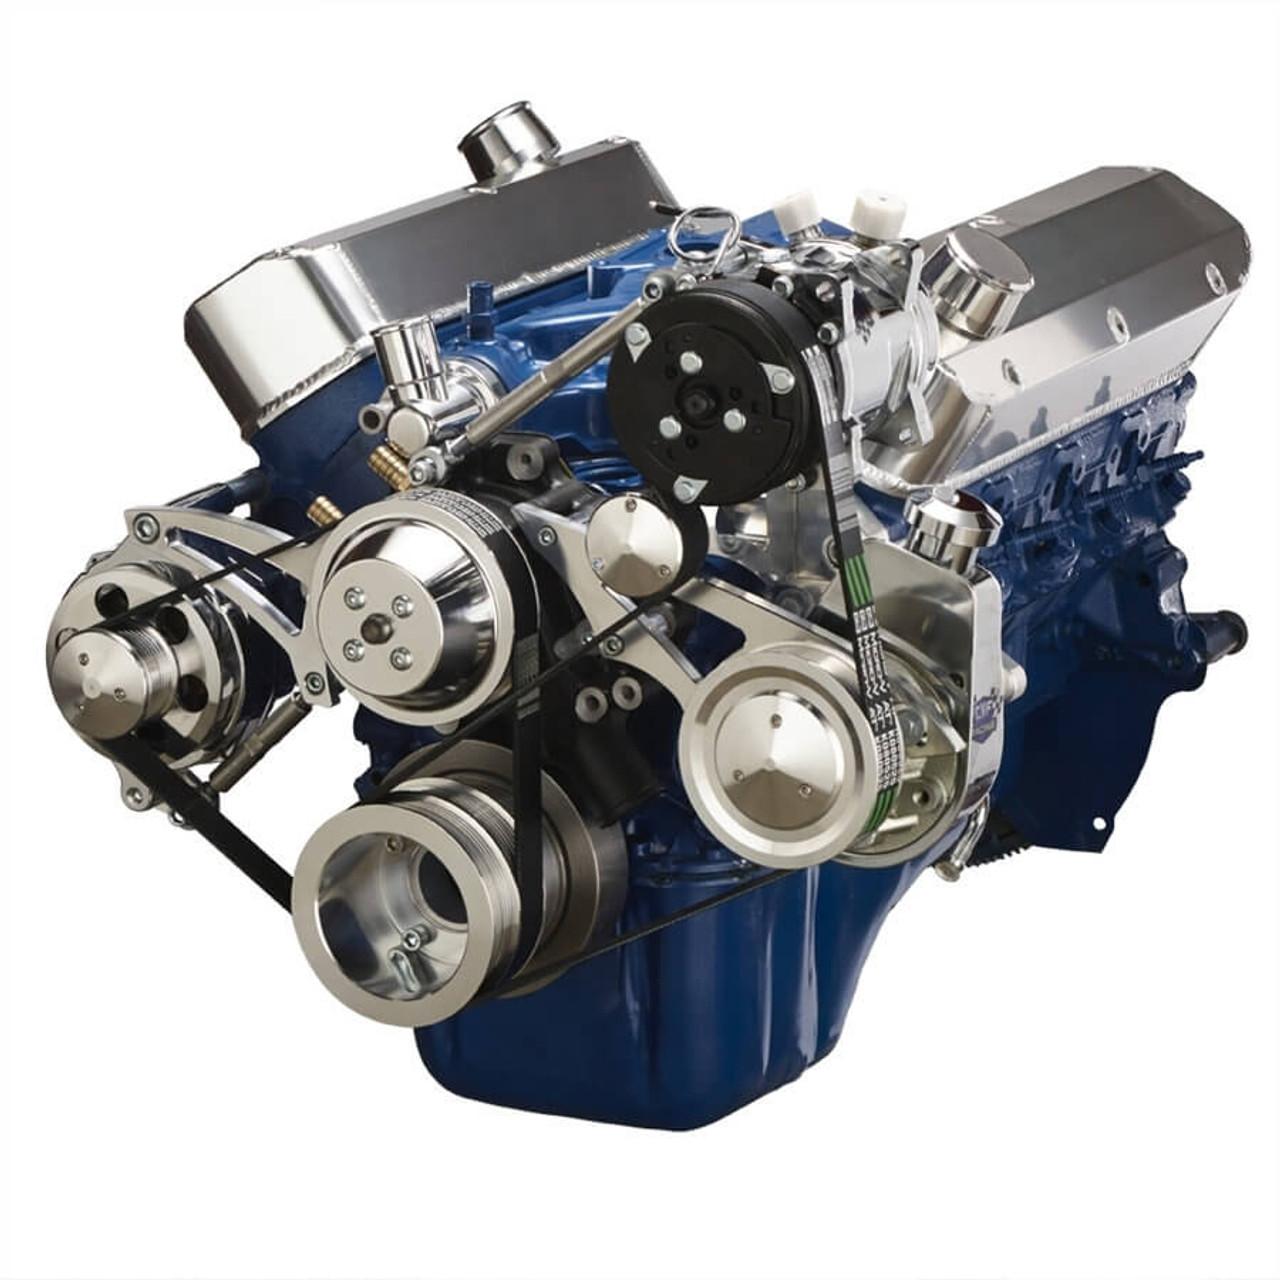 Ford Serpentine Brackets Pulley Kit 289 302 351w